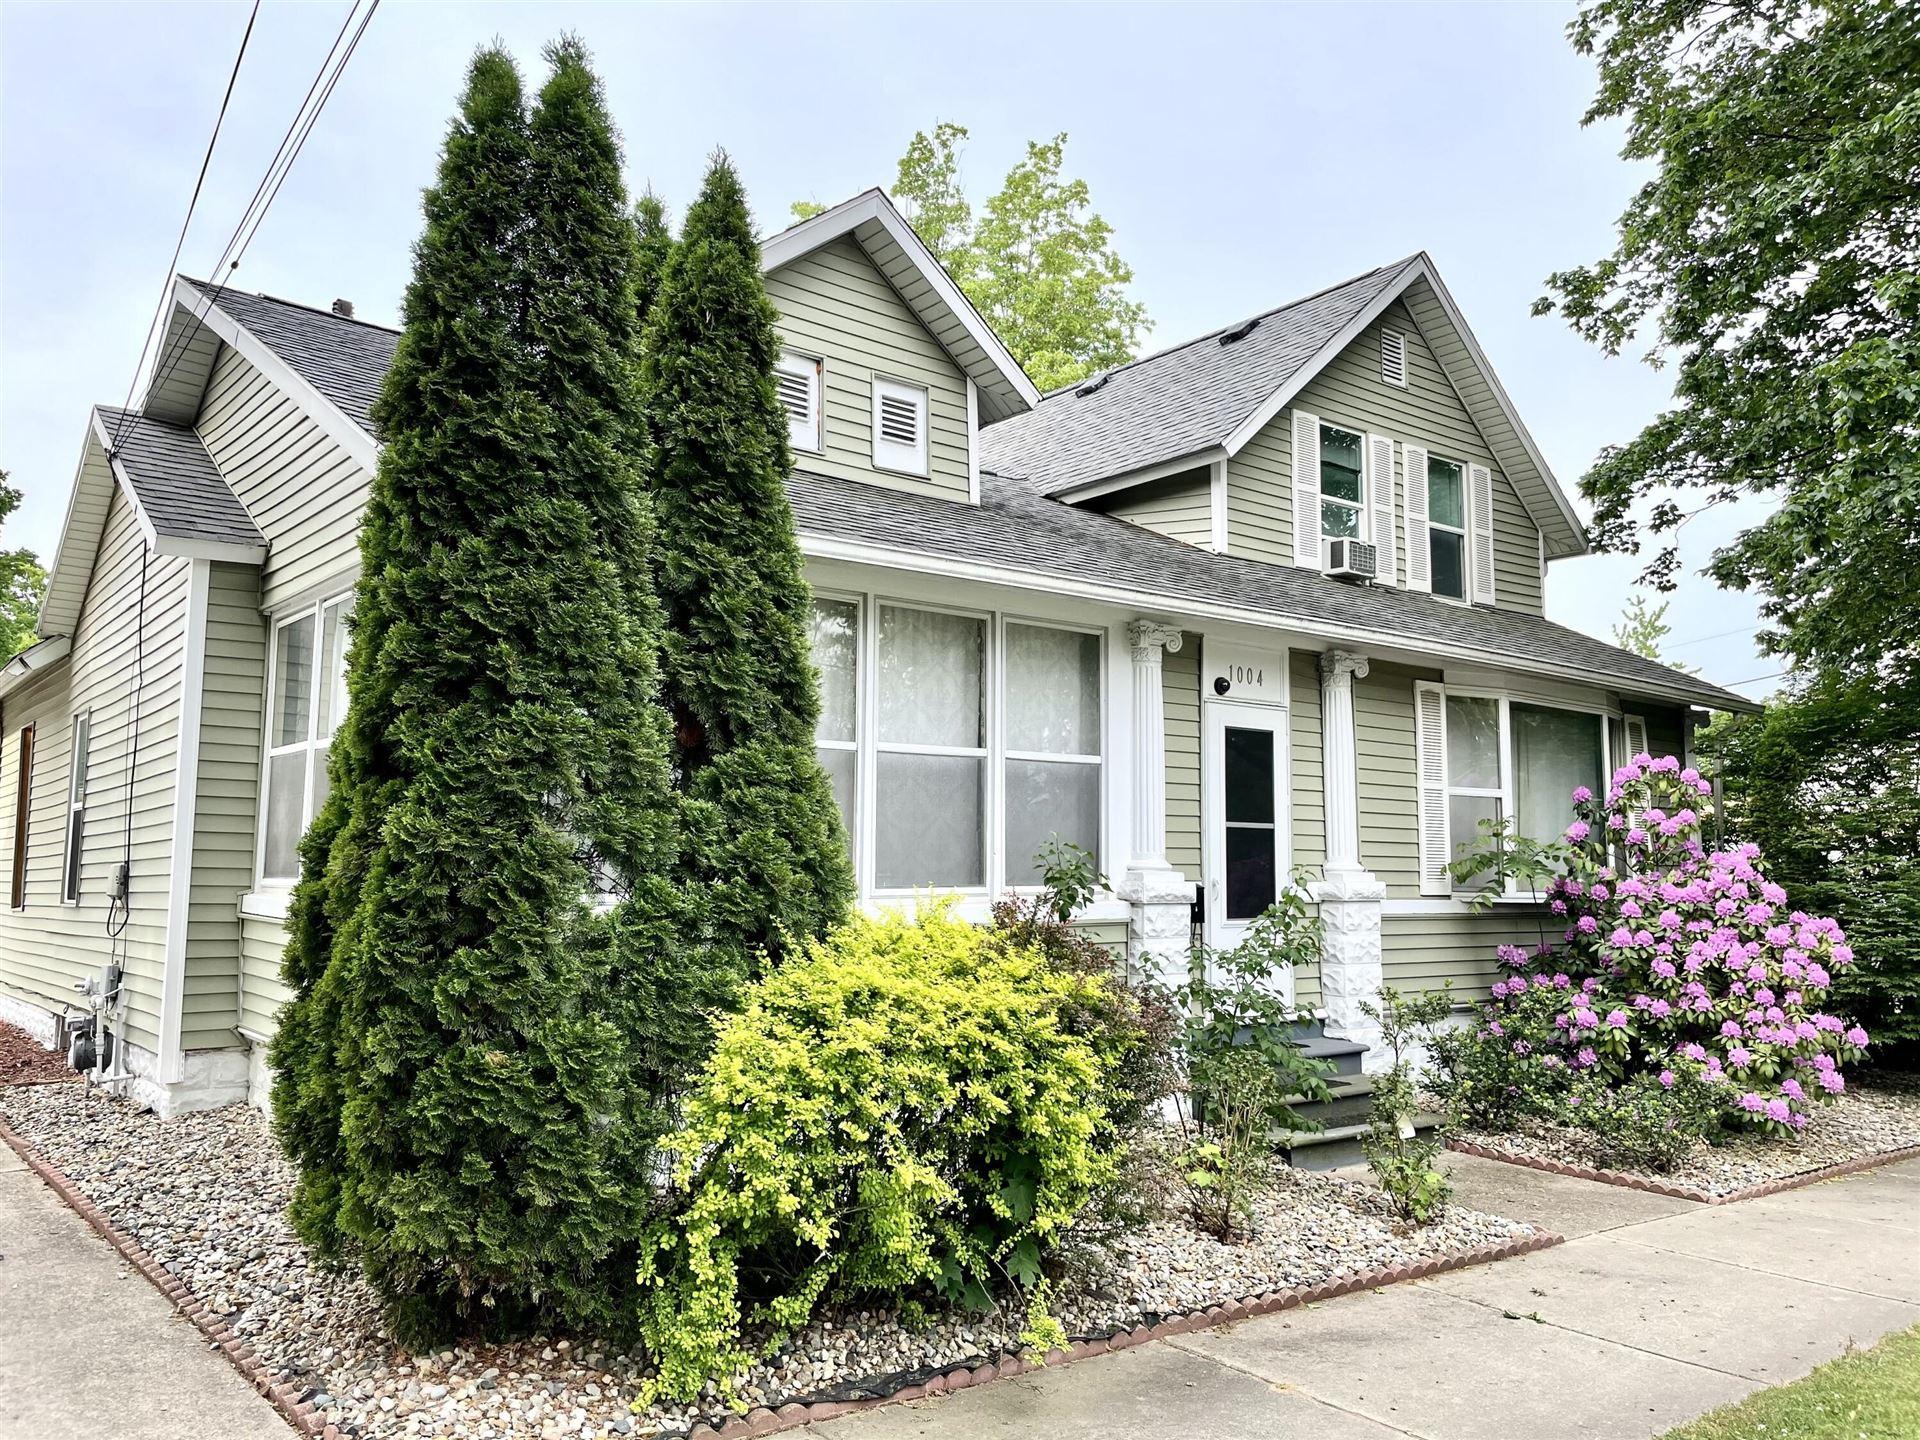 1004 Sycamore Street, Niles, MI 49120 - MLS#: 21023793